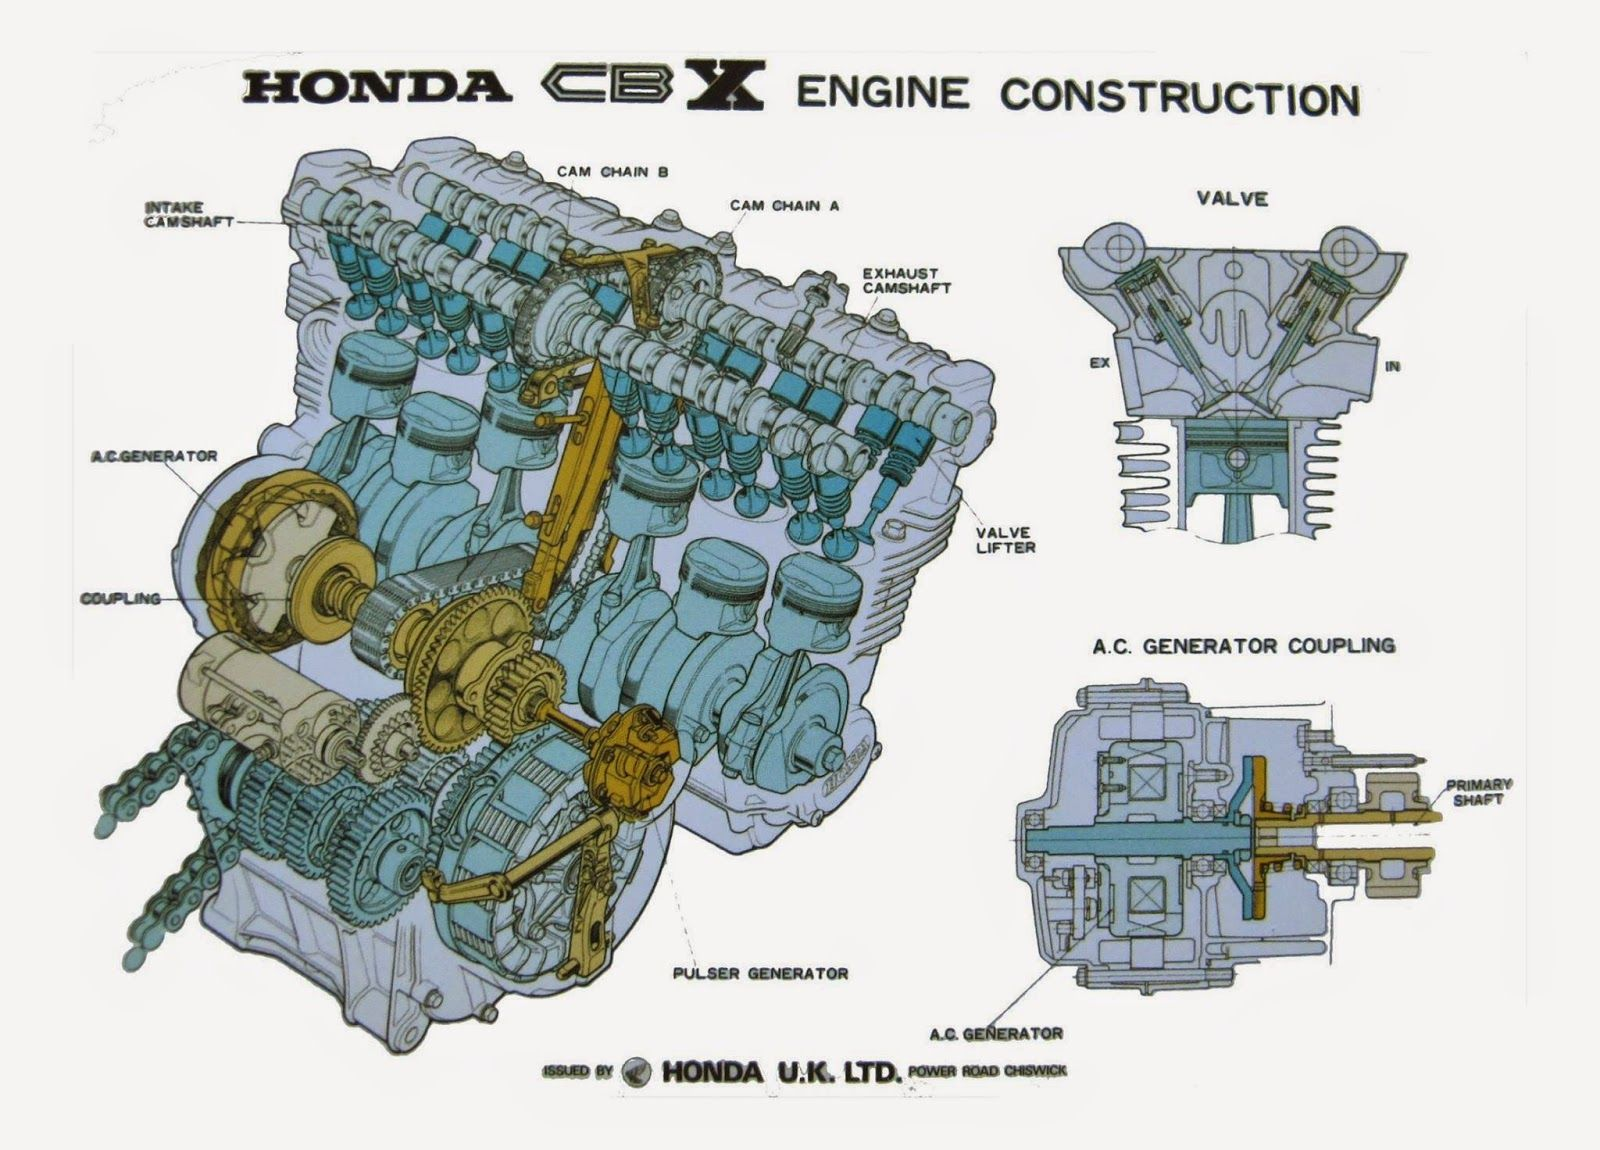 racing caf honda cbx engine diagram motorcycle engines and racing engine diagram racing caf honda cbx [ 1600 x 1150 Pixel ]